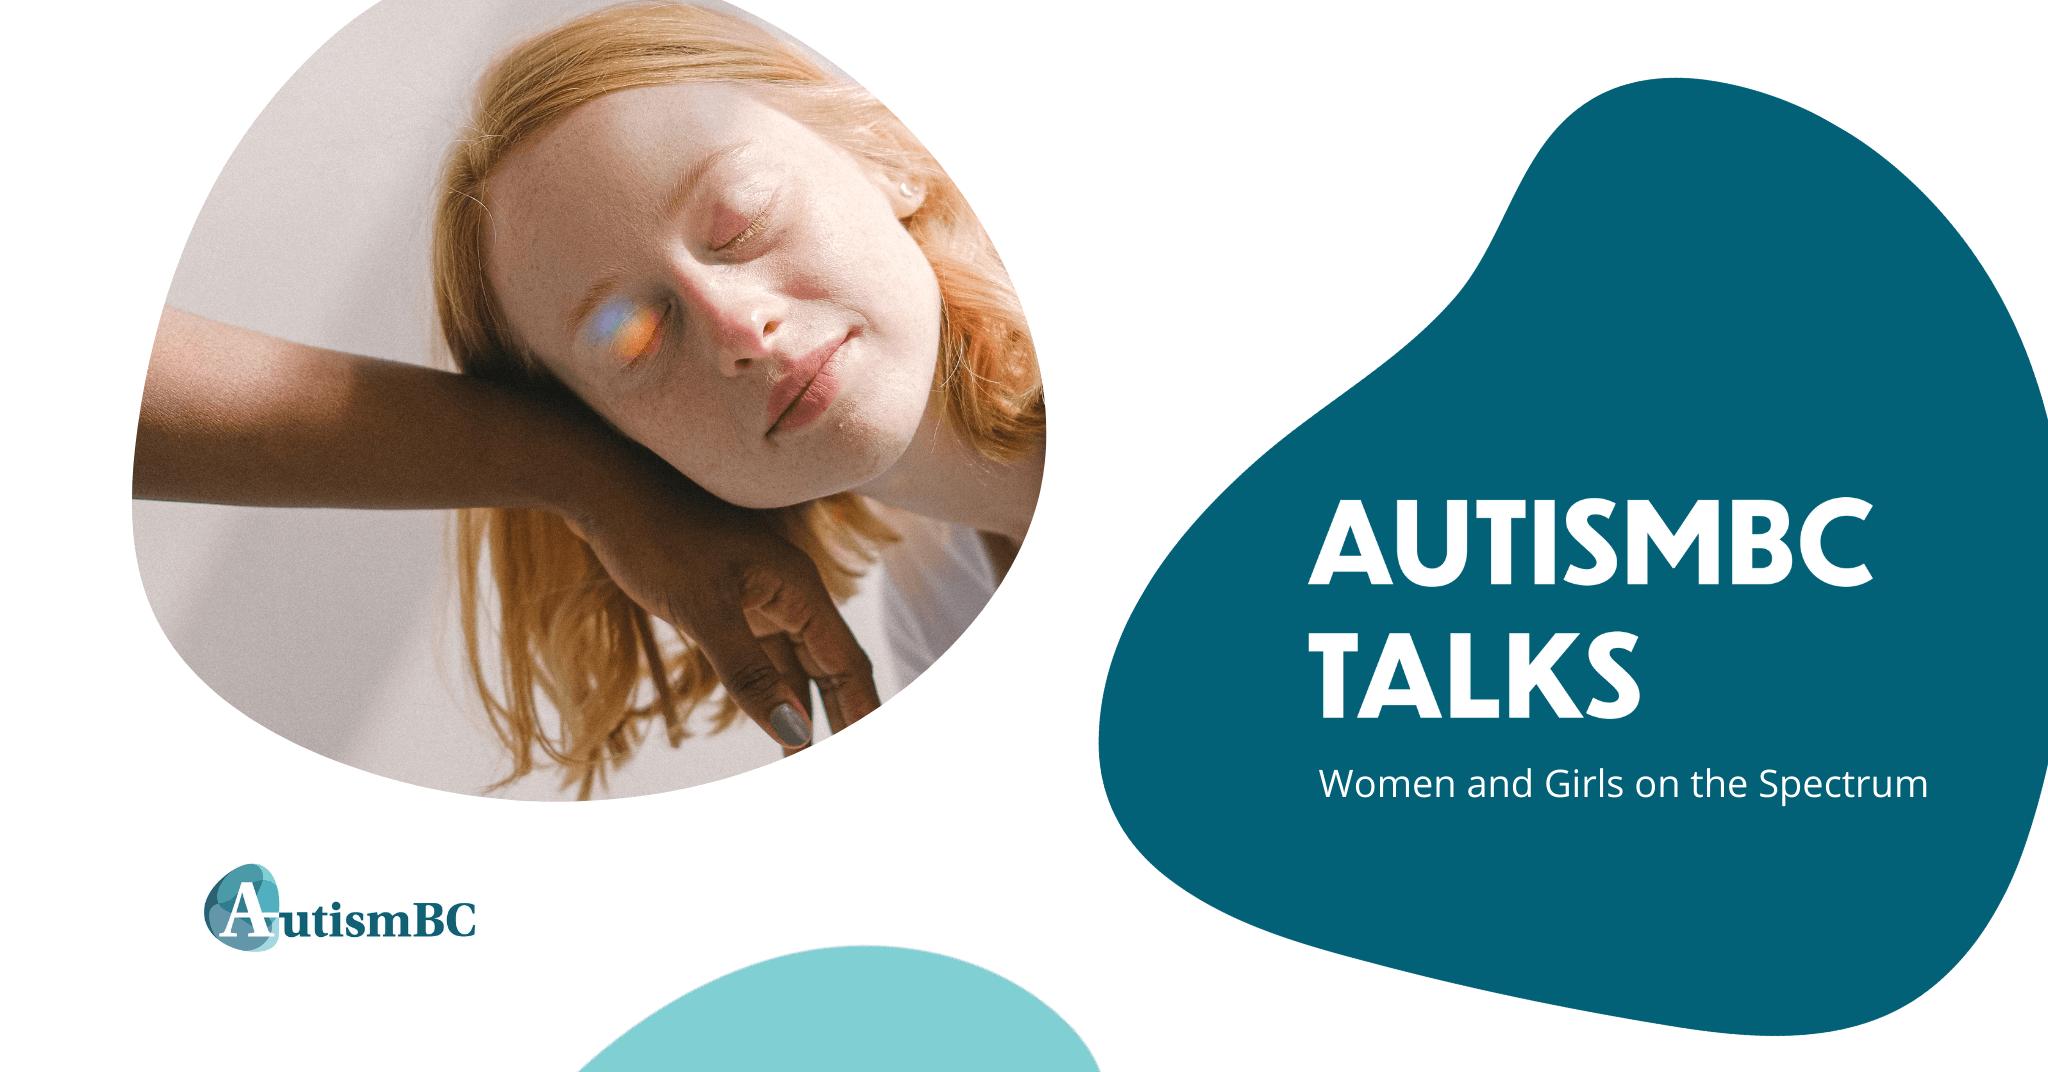 AutismBC Talks: Women and Girls on the Autism Spectrum